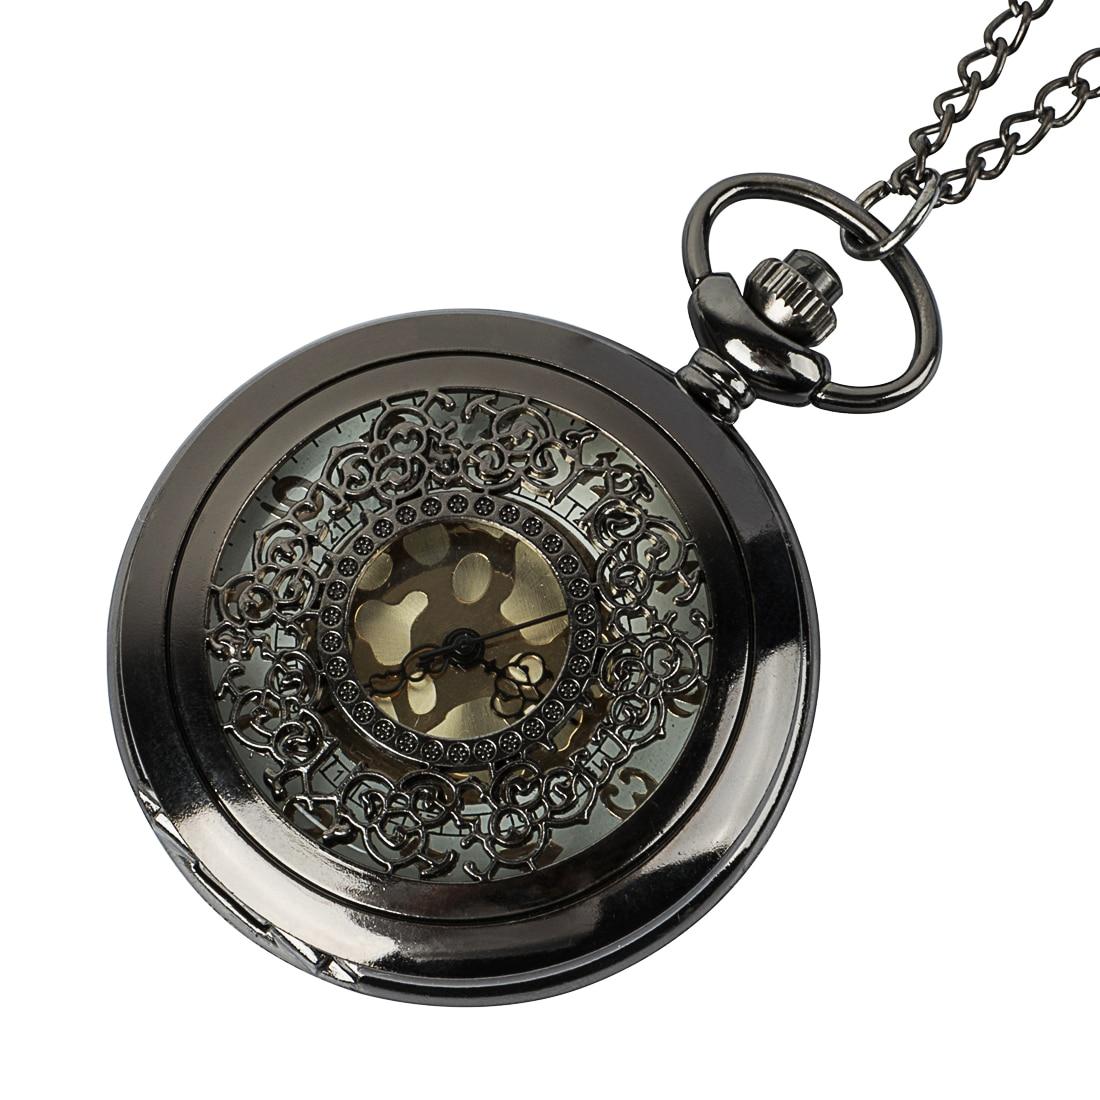 Roman Numerals Quartz Necklace Pocket Fob Watches Chain Men Women Clock Vintage Bronze Pocket Watch in Pocket Fob Watches from Watches